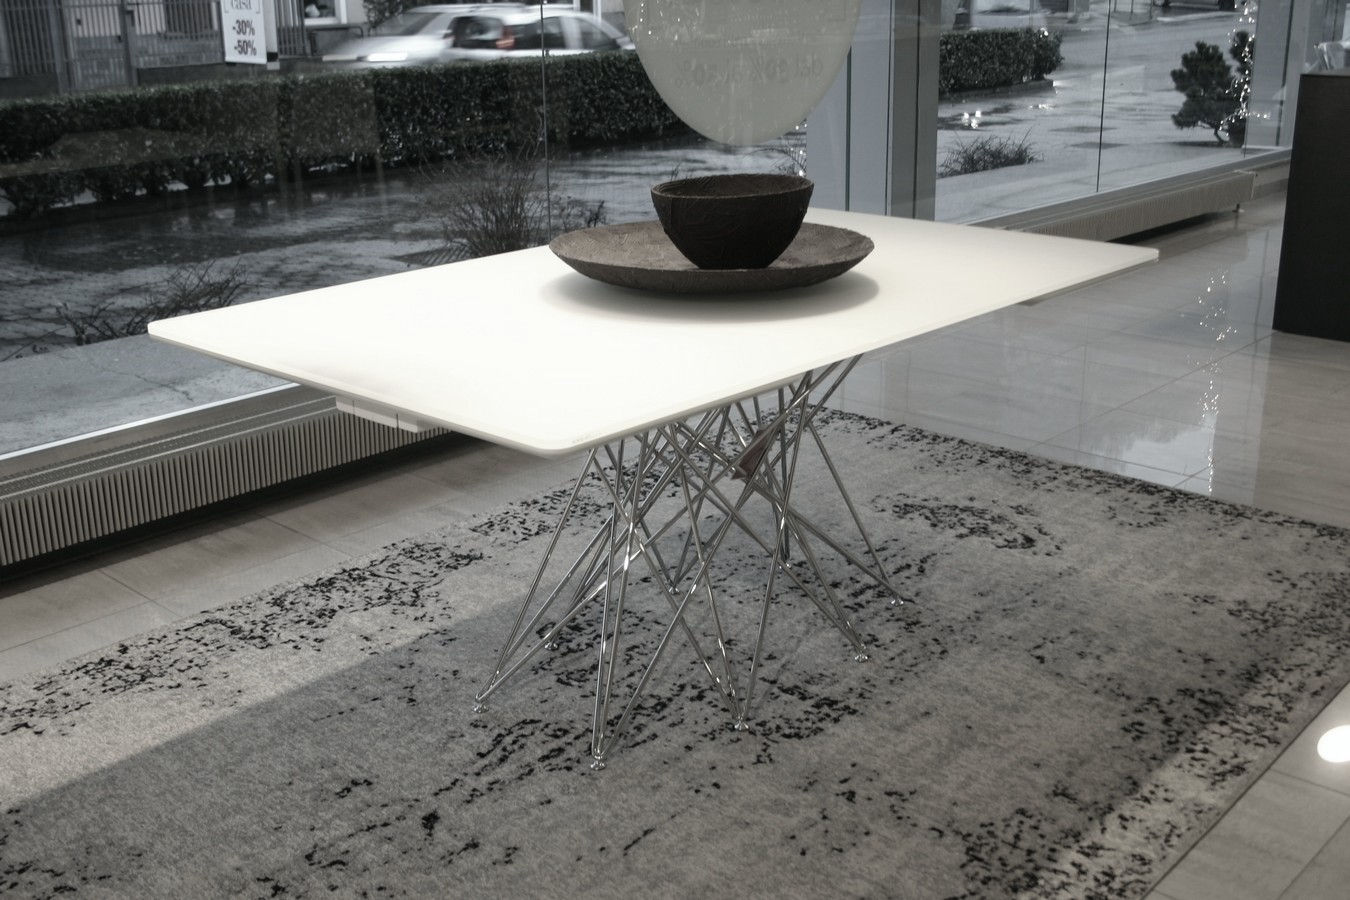 Outlet tavoli e outlet sedie a bergamo carminati e sonzogni